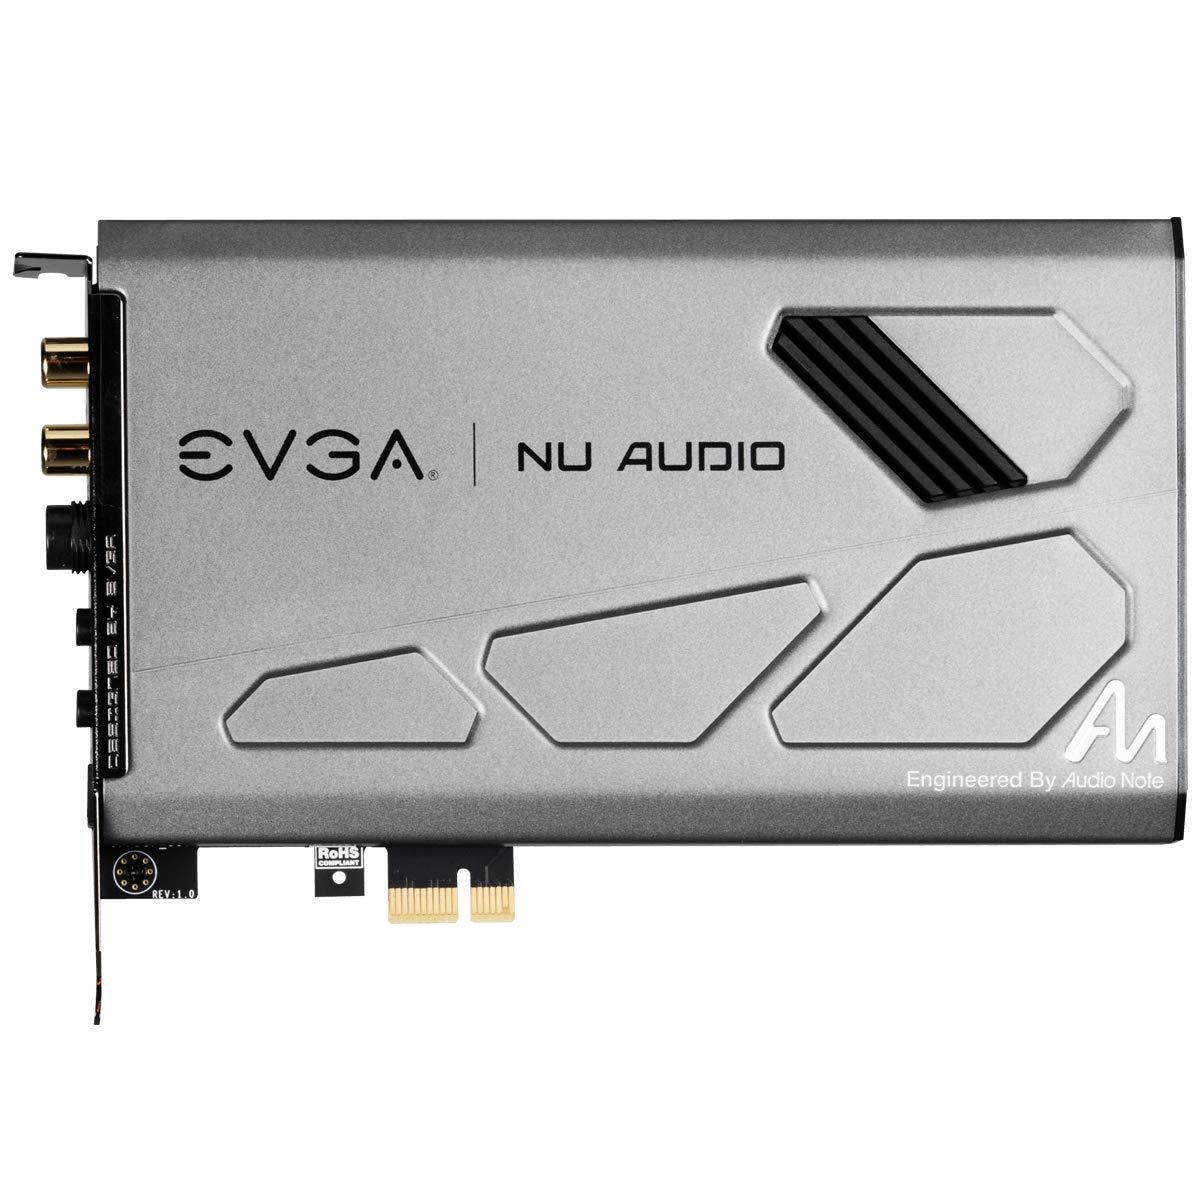 EVGA Nu Audio Card, 712-P1-AN01-KR, Lifelike Audio, PCIe, RGB LED, Designed with Audio Note (UK) by EVGA (Image #3)